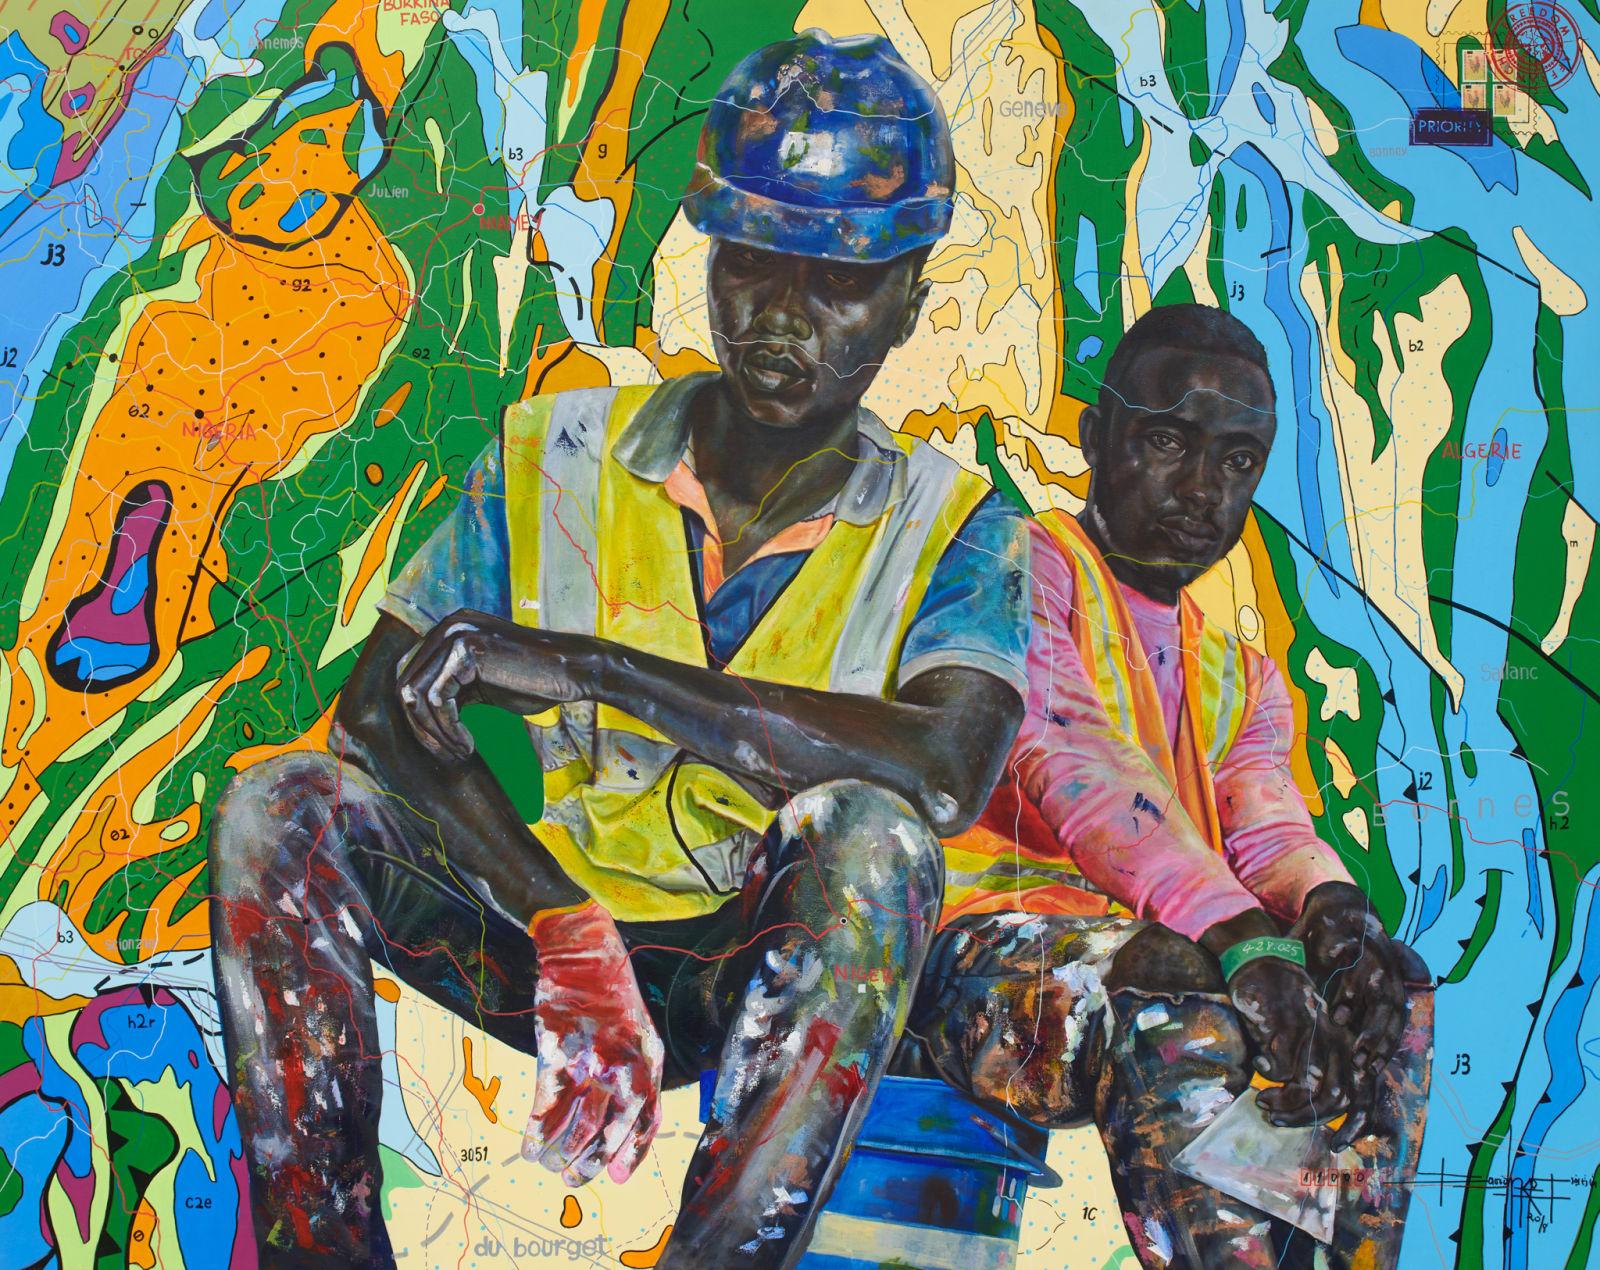 Jean David Nkot  www.hemle.com, 2018  Acrylic & Posca on canvas  200 x 160 cm